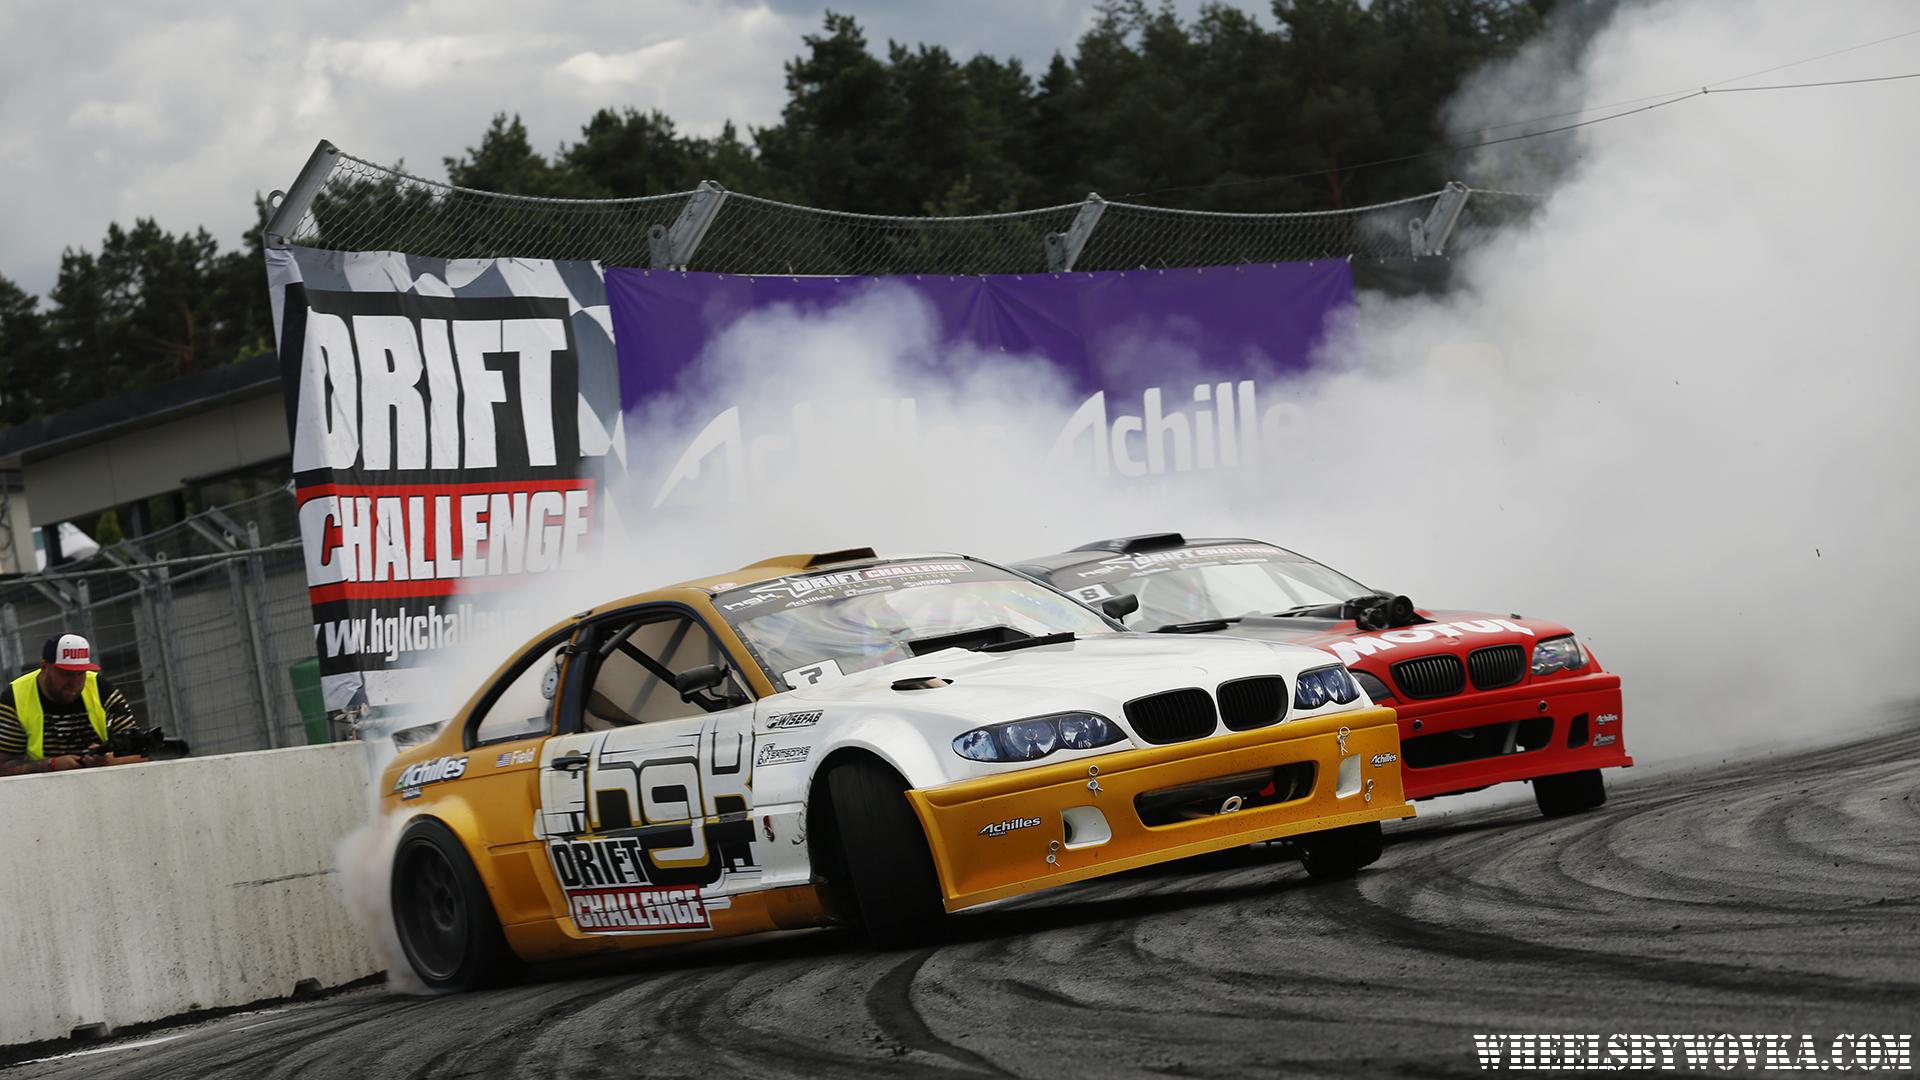 hgk-drift-challenge-2018-by-wheelsbywovka-35